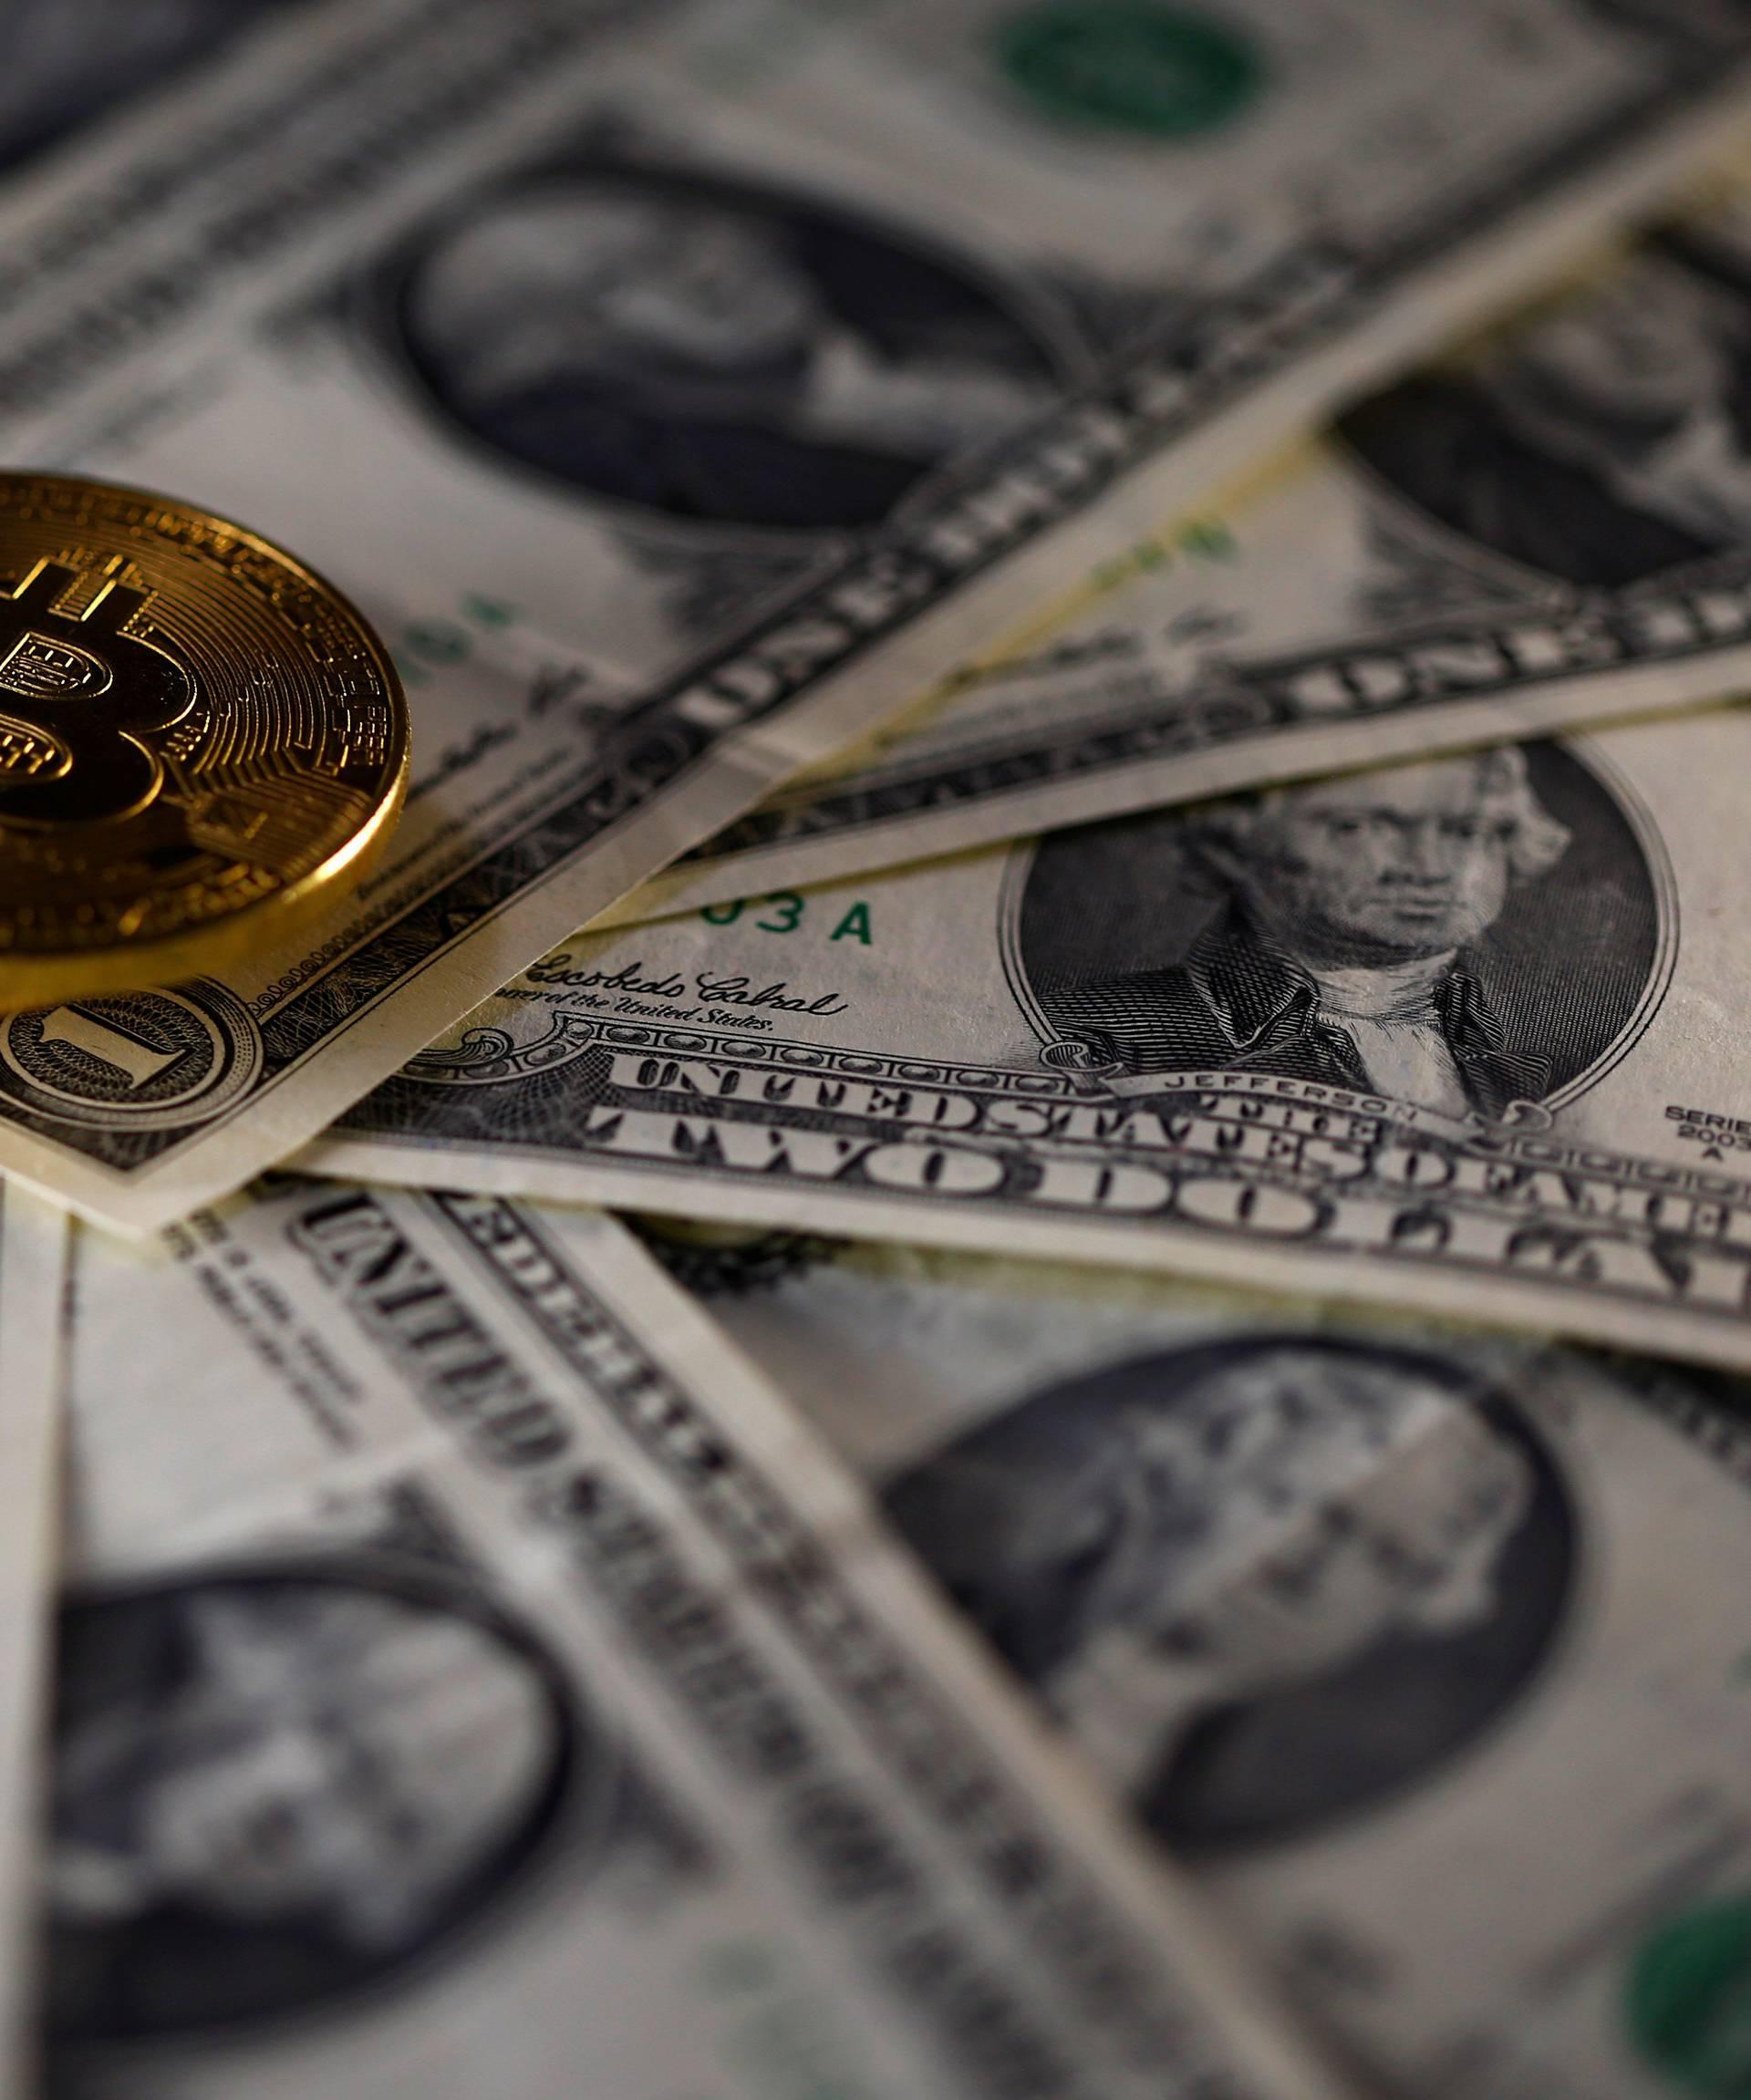 Zaradio bitcoins binary options trading strategy mmxiii